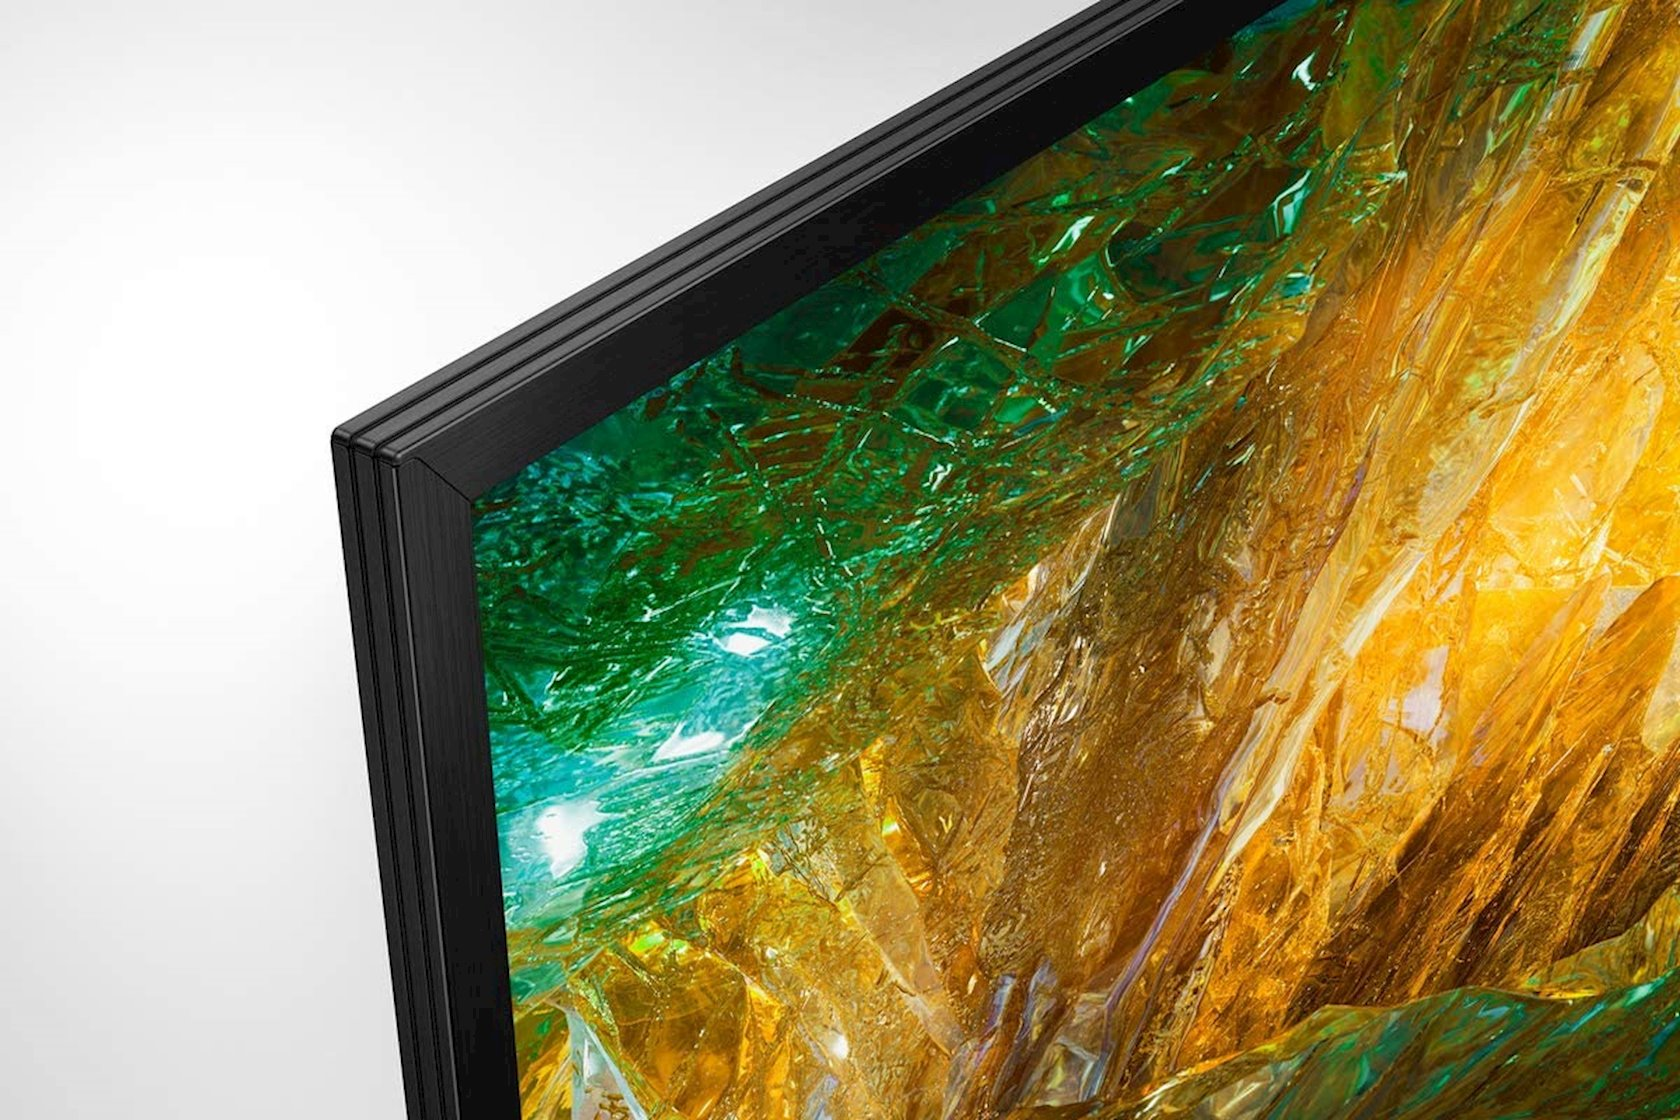 Televizor Sony KD-65XH8096